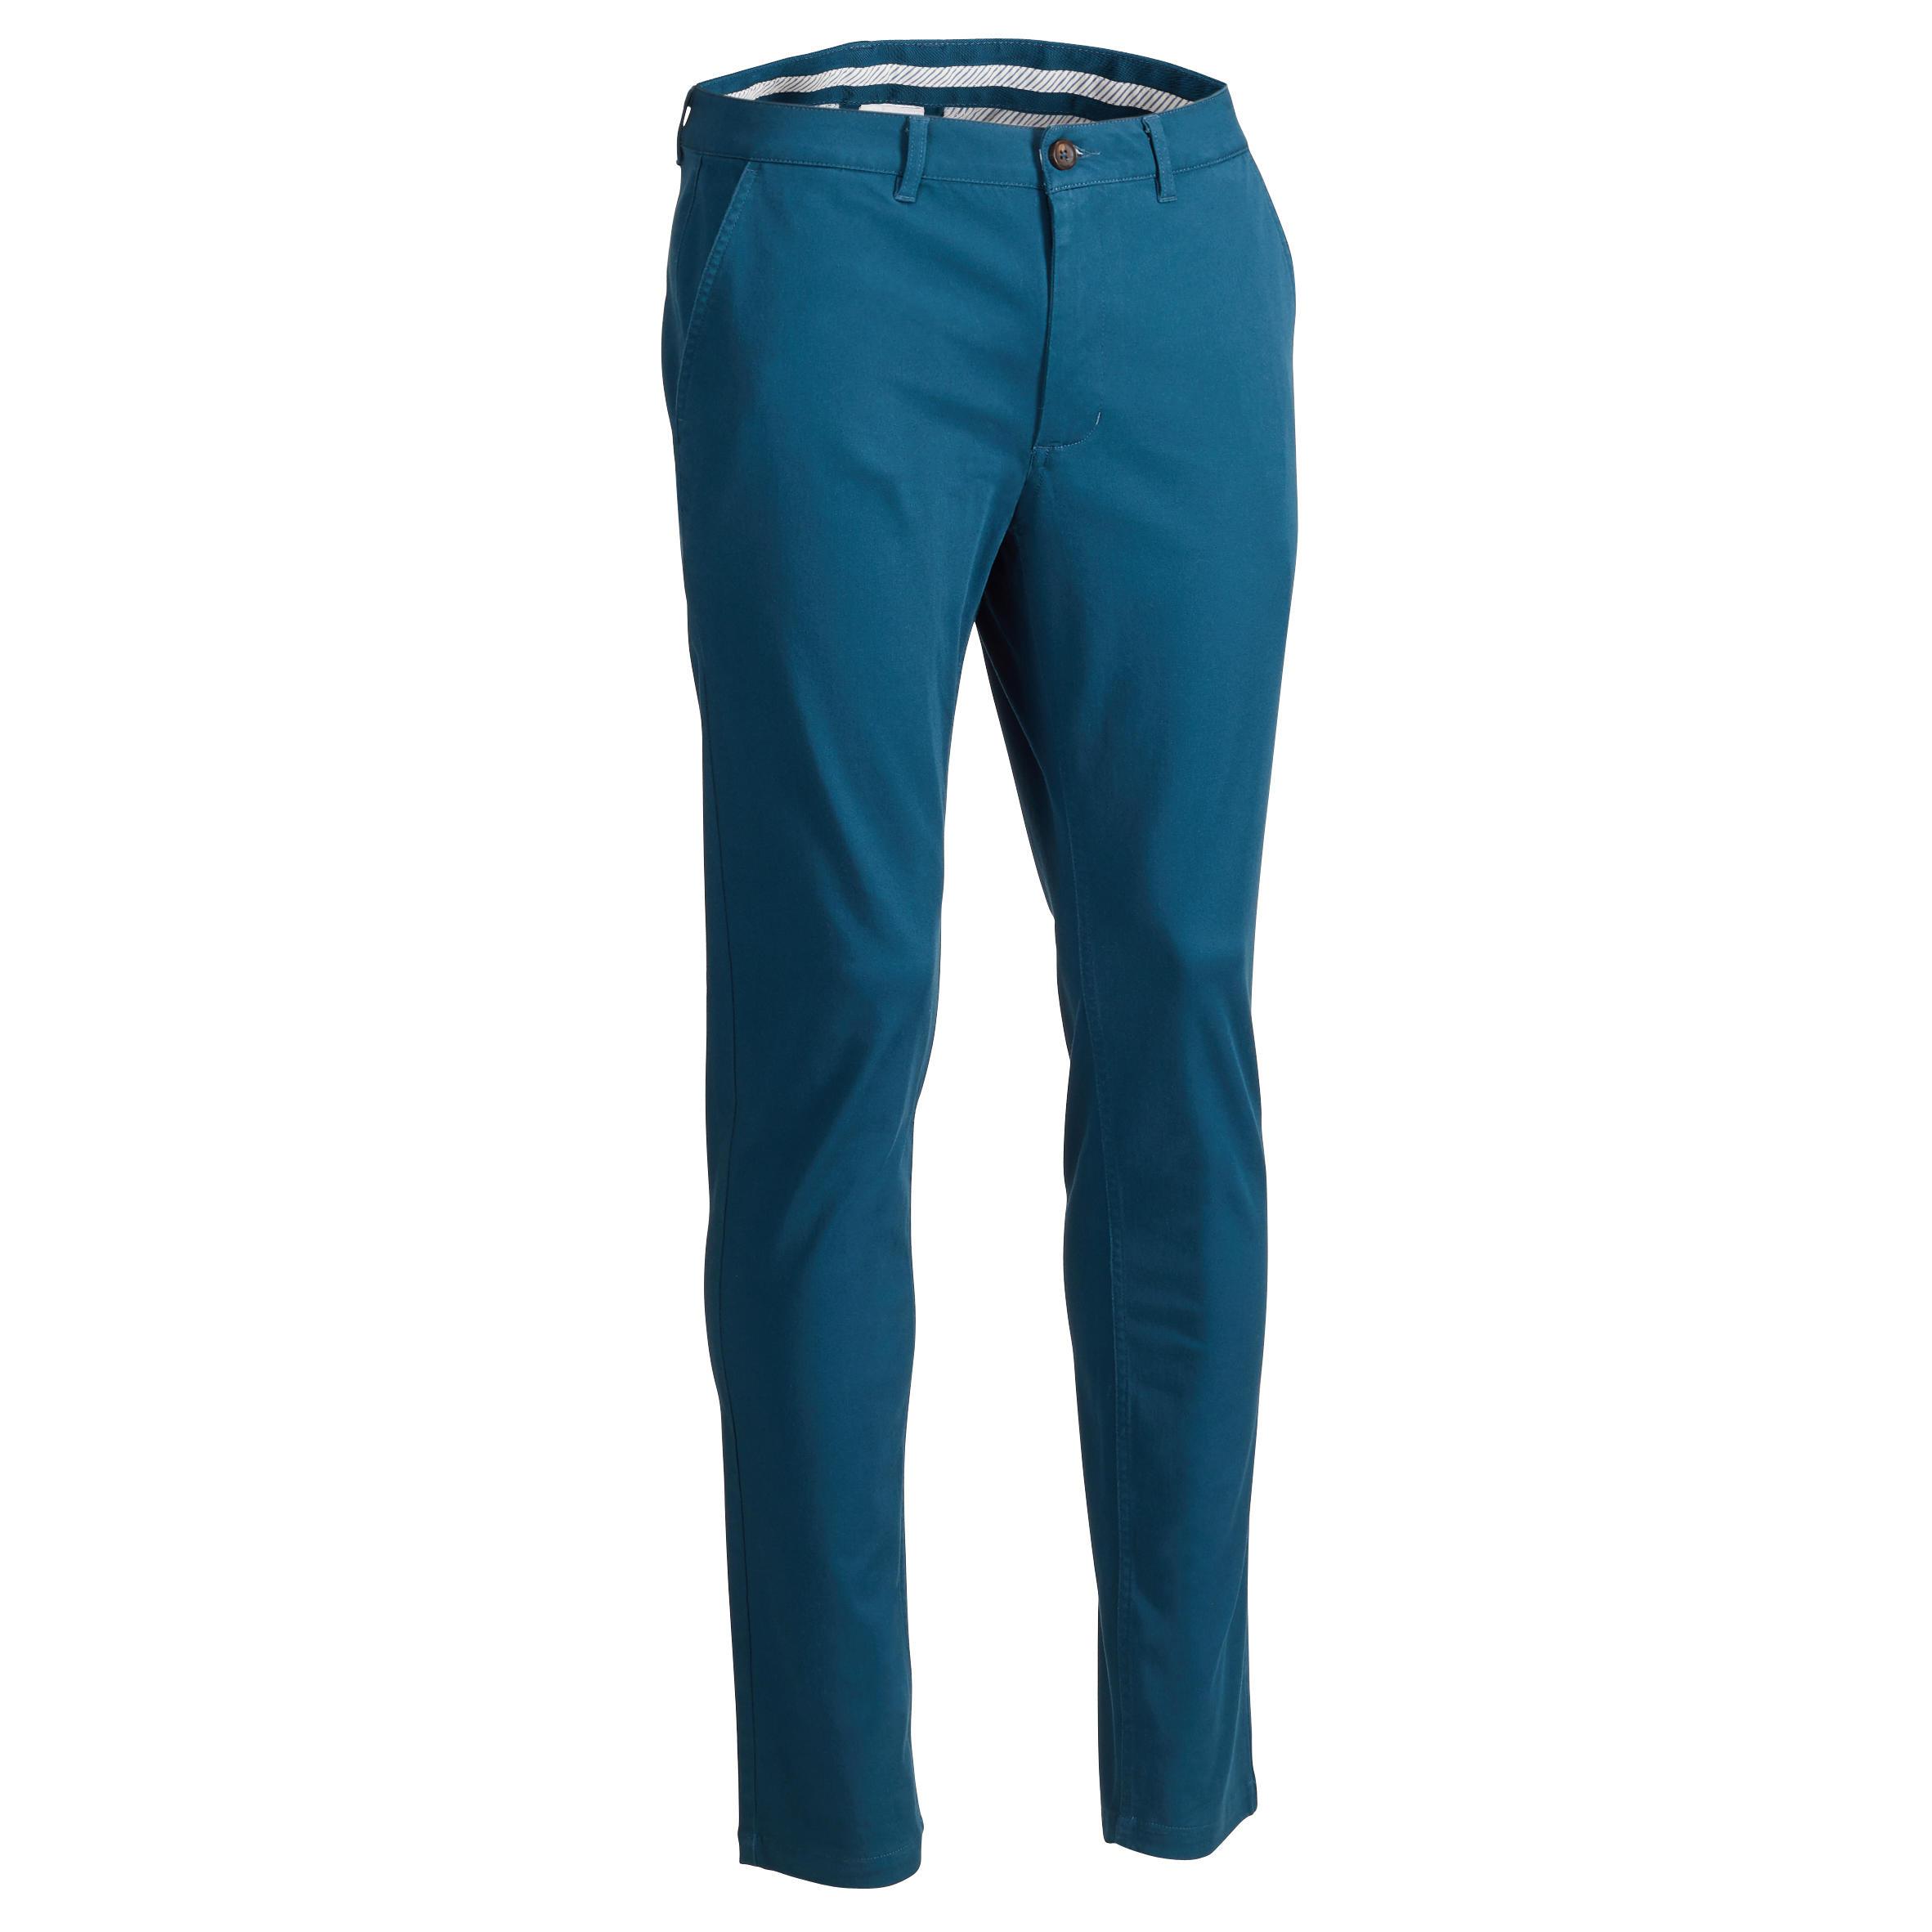 Pantalon Golf Bărbați imagine